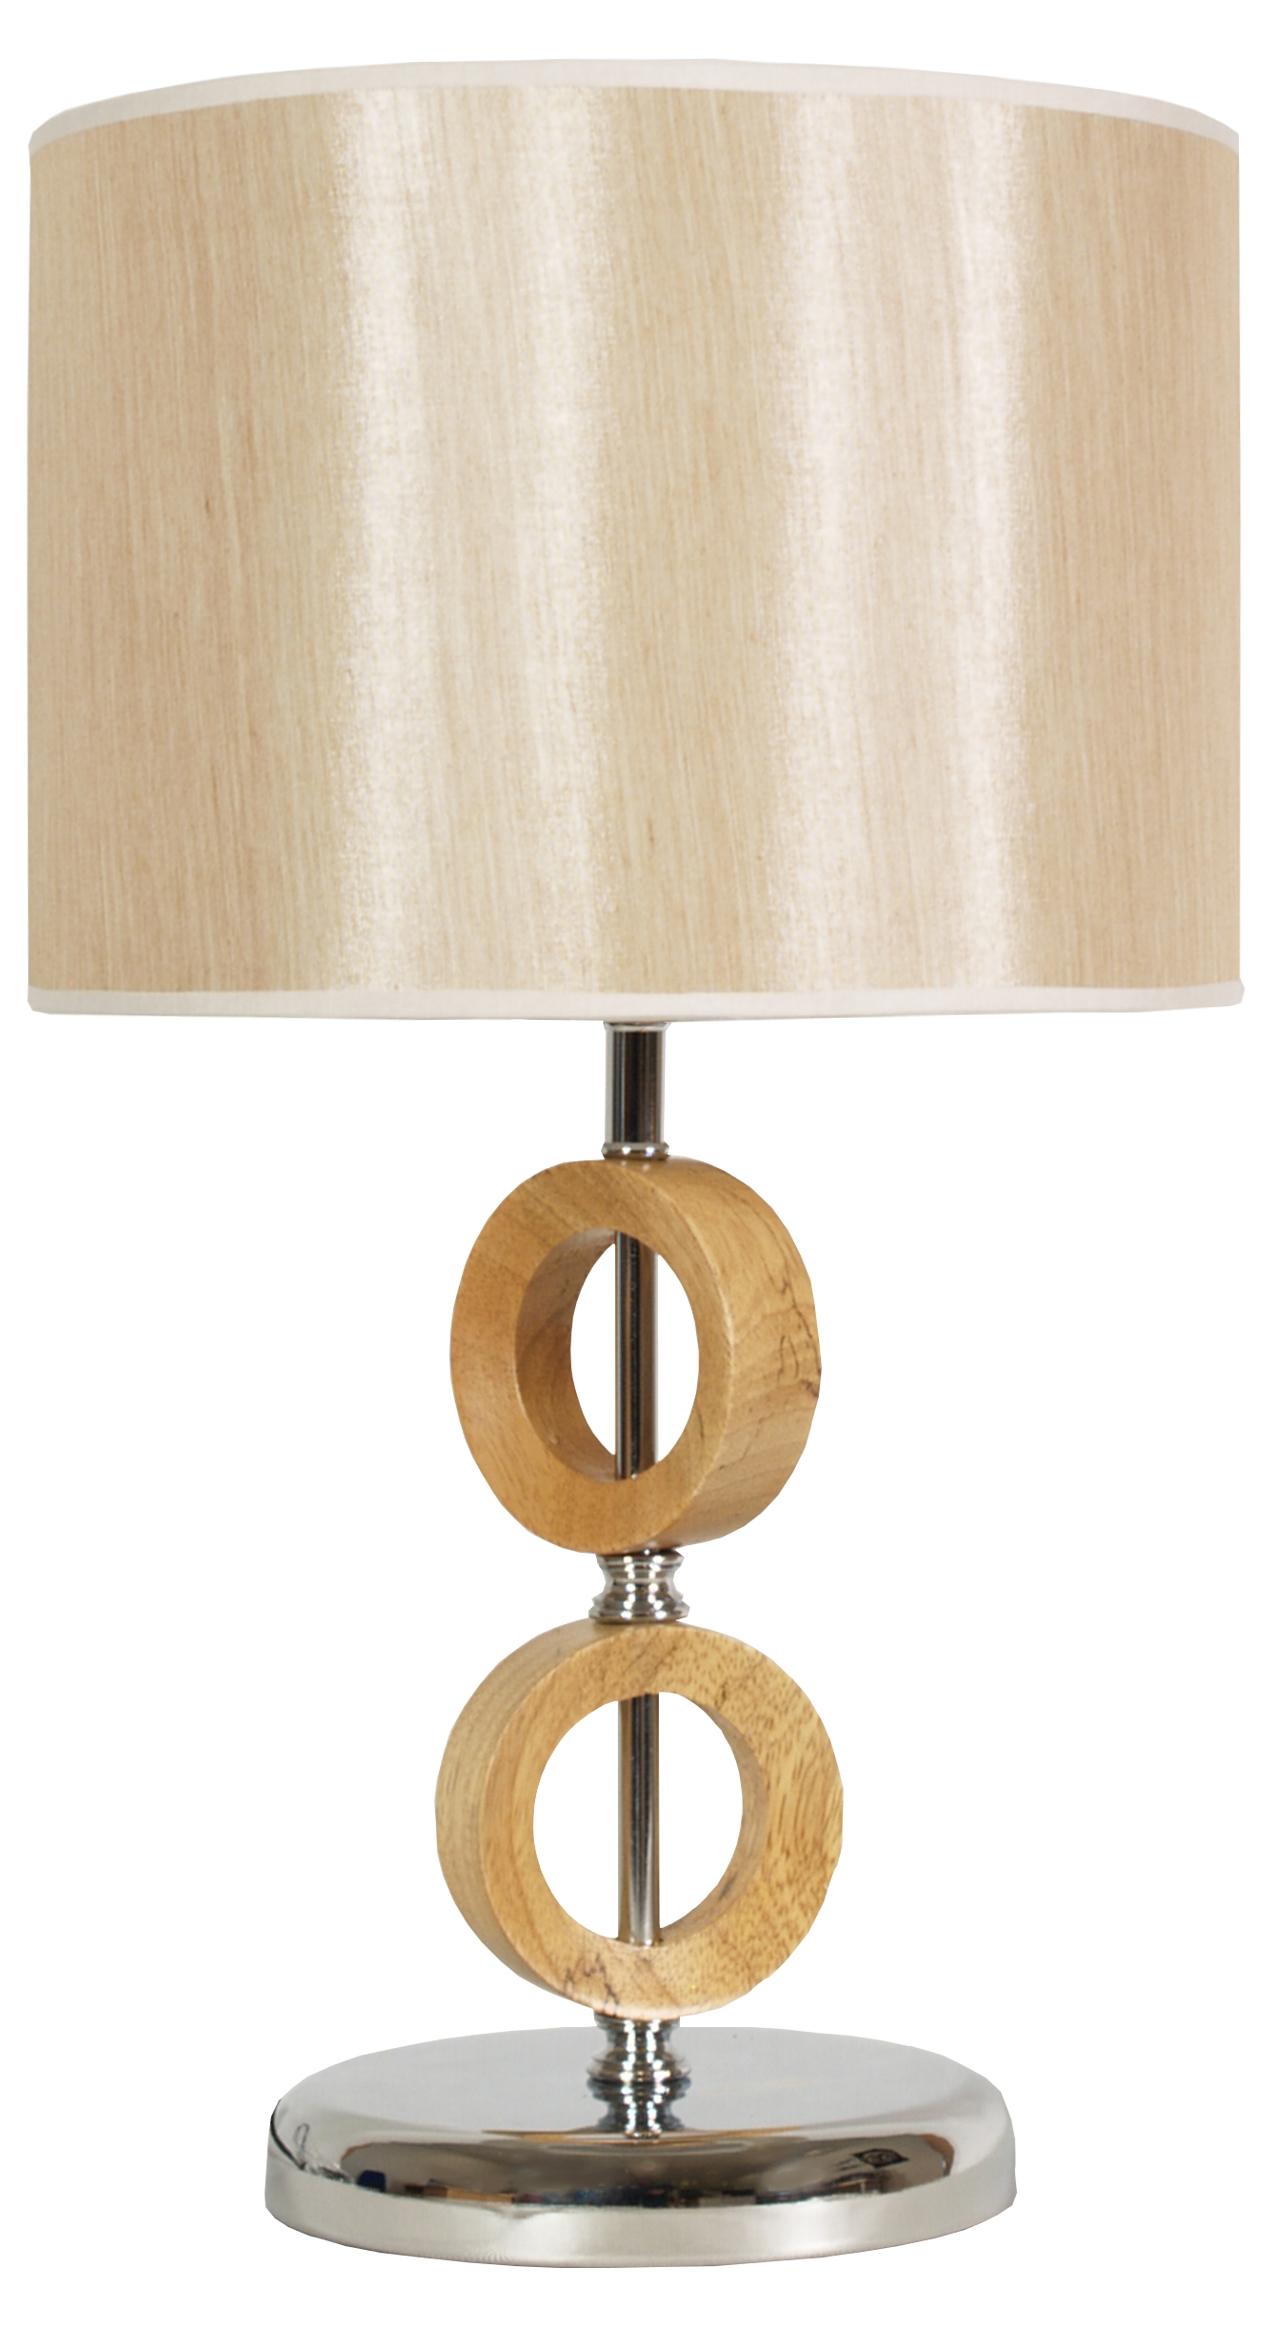 ANELLO LAMPA GABINETOWA 1X60W E27 H-43 BEŻOWA - 41-01108